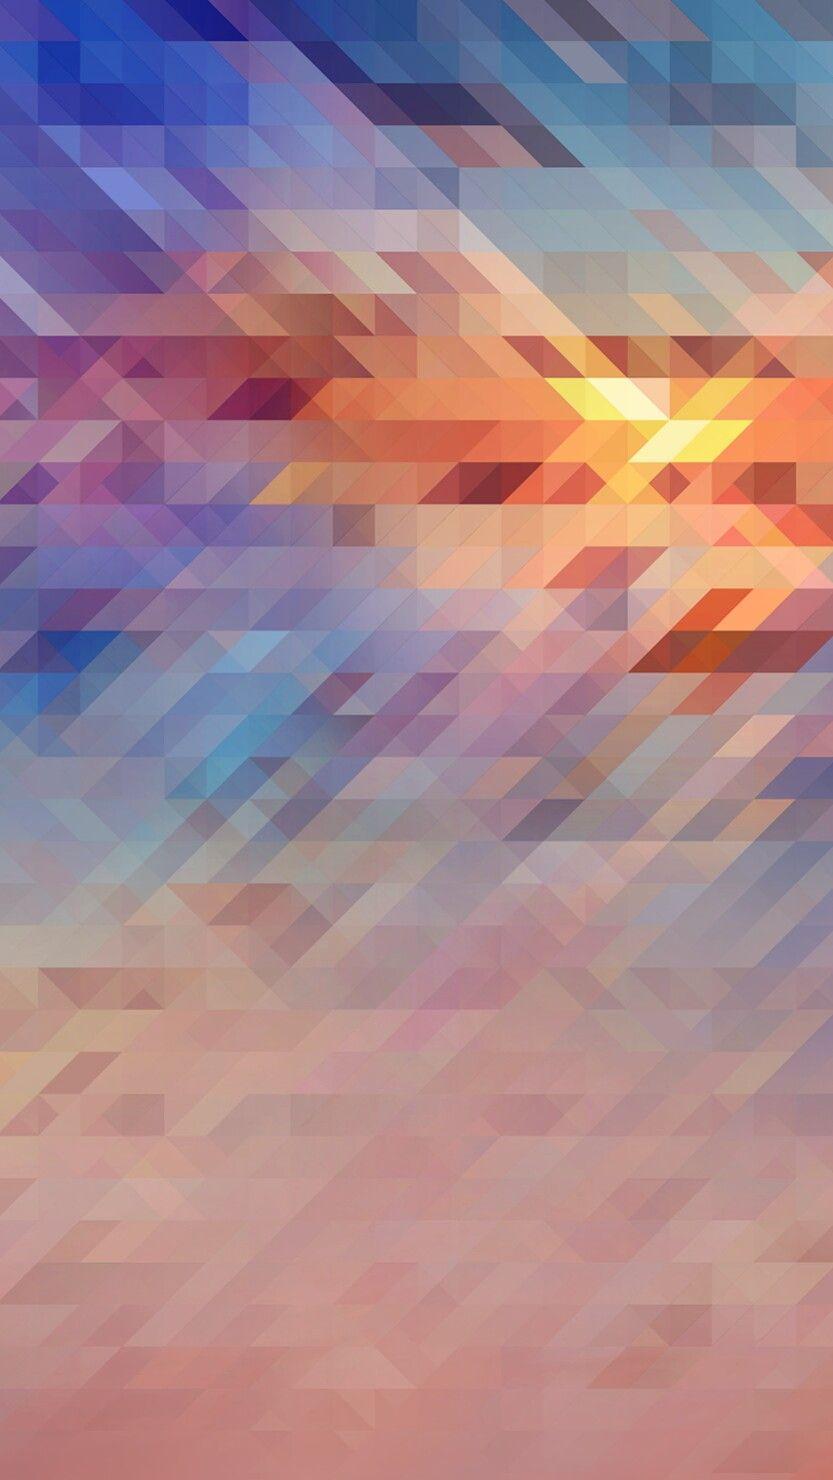 Galaxy a6 Material Minimal Pattern in 2019 Ios 11 wallpaper 833x1480